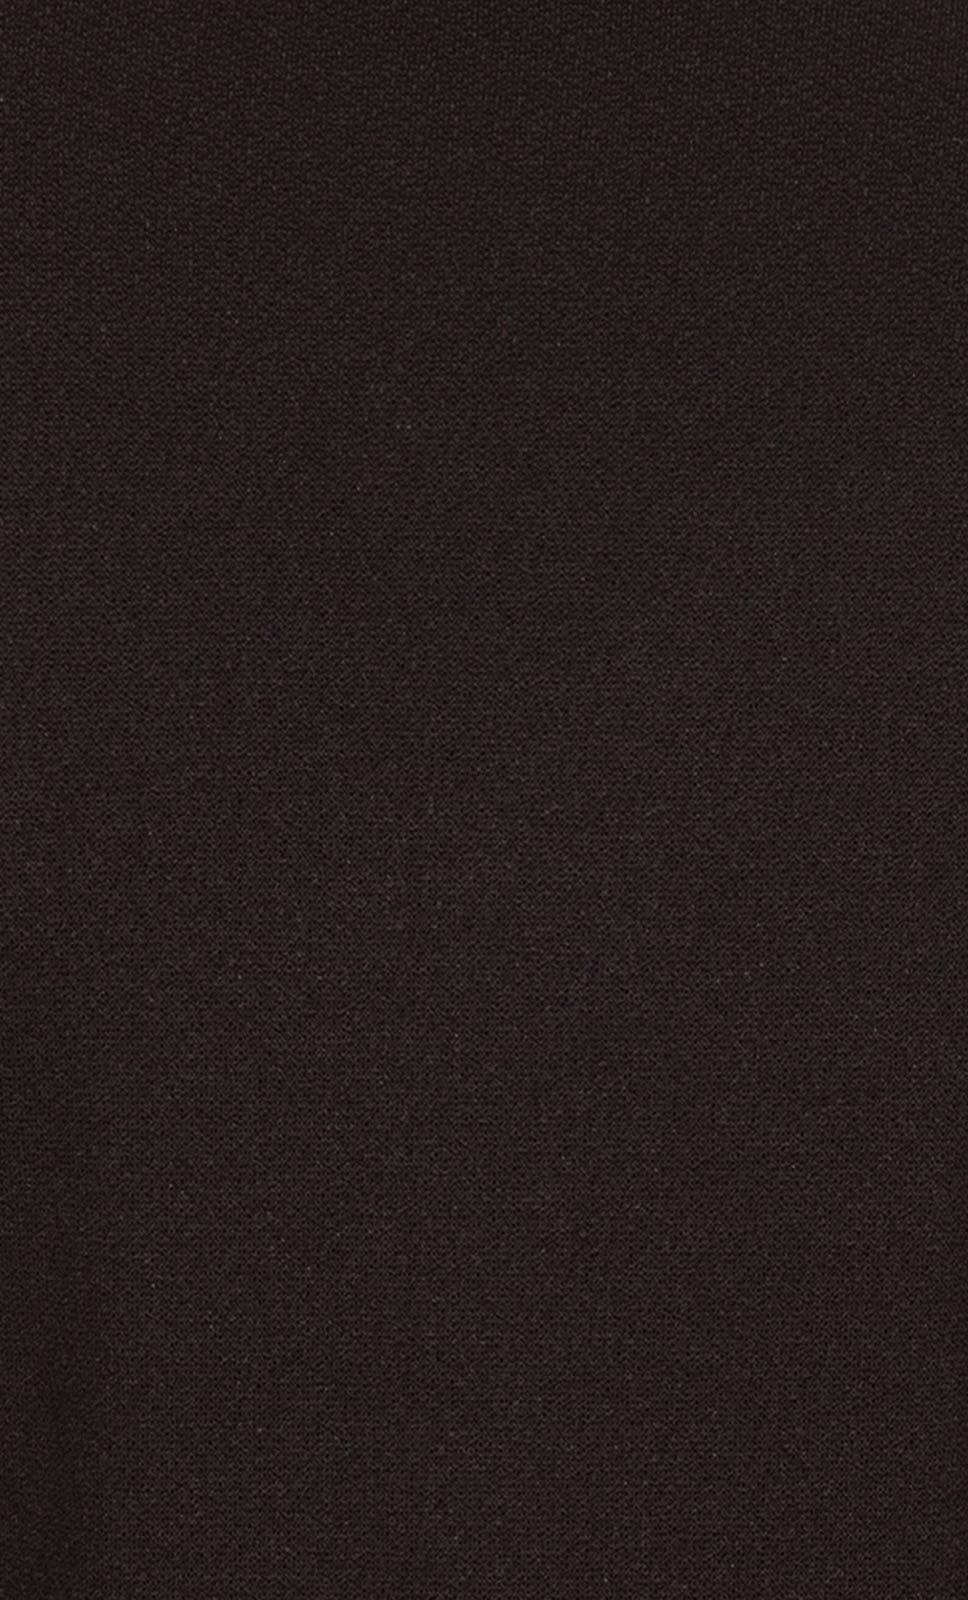 Milano-Crepe-Black